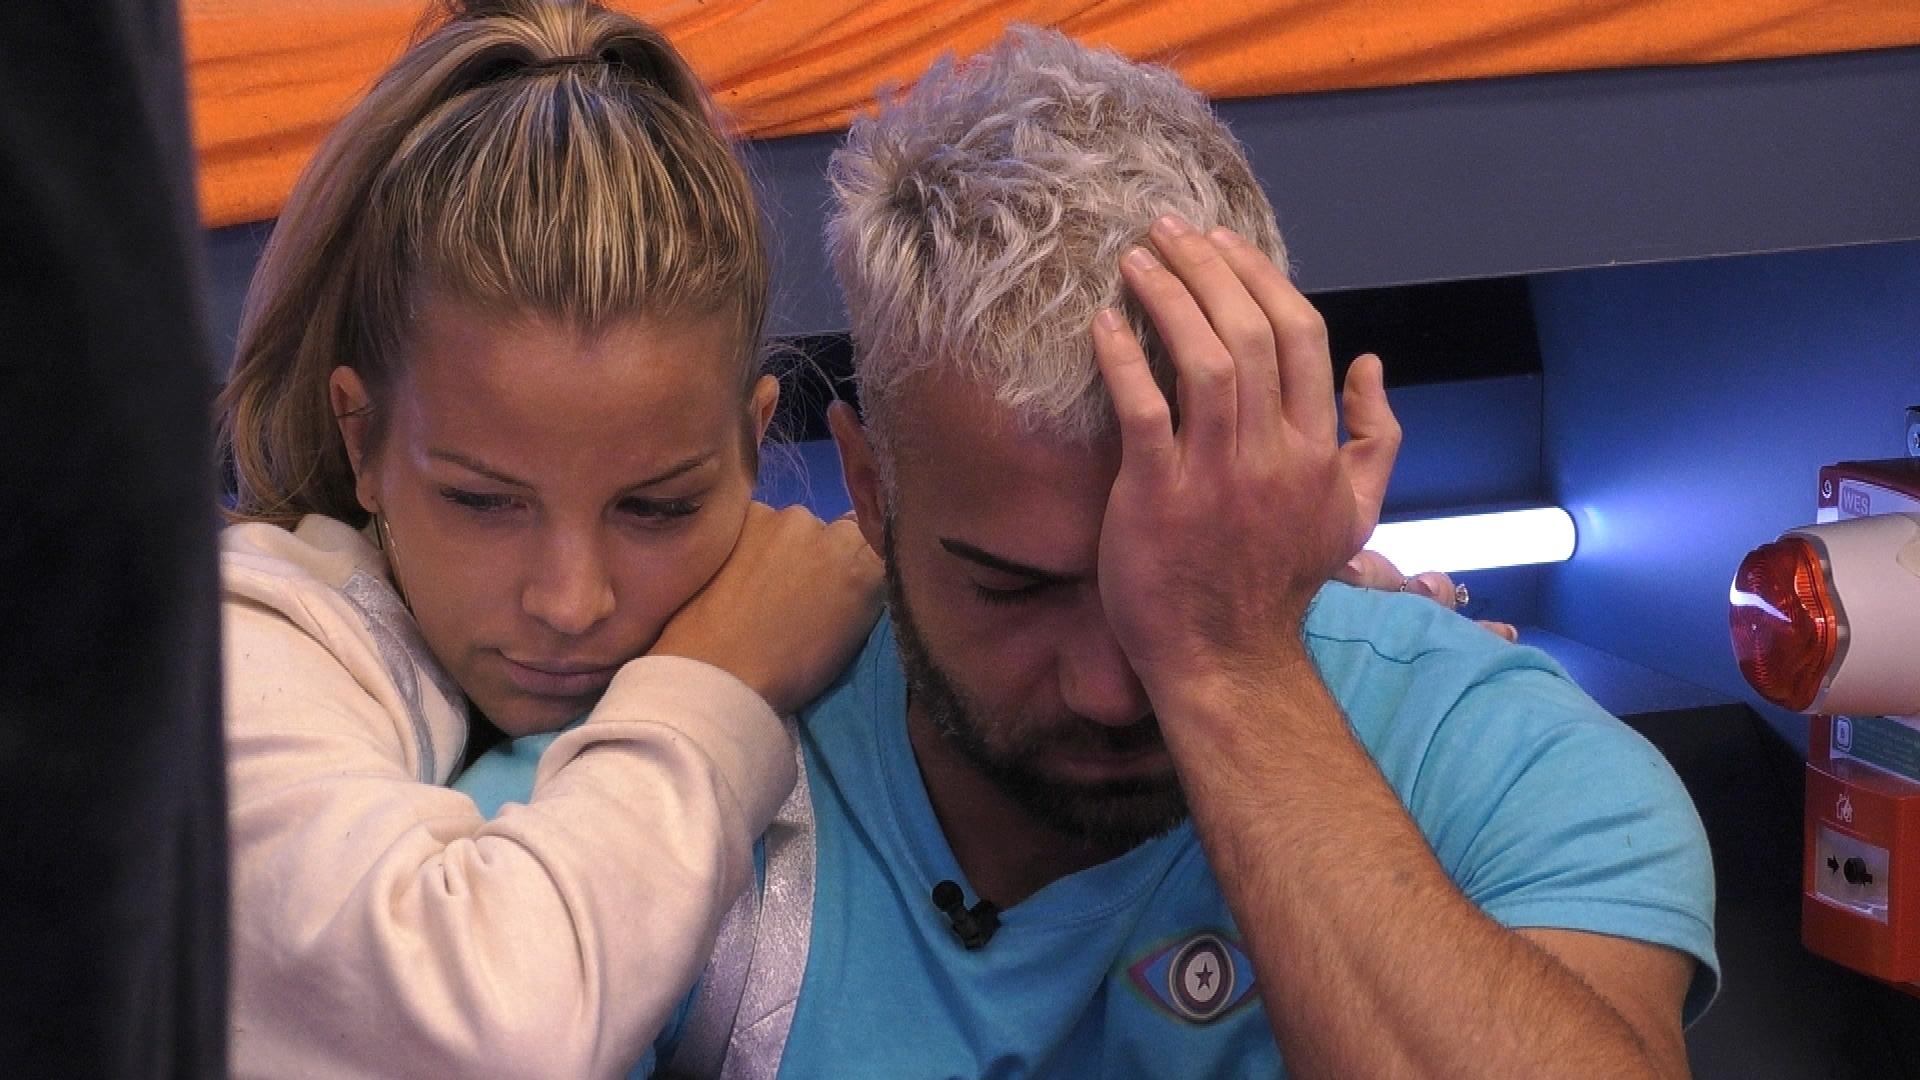 Promi Big Brother 2021 Rafi Rachek Nerven weint